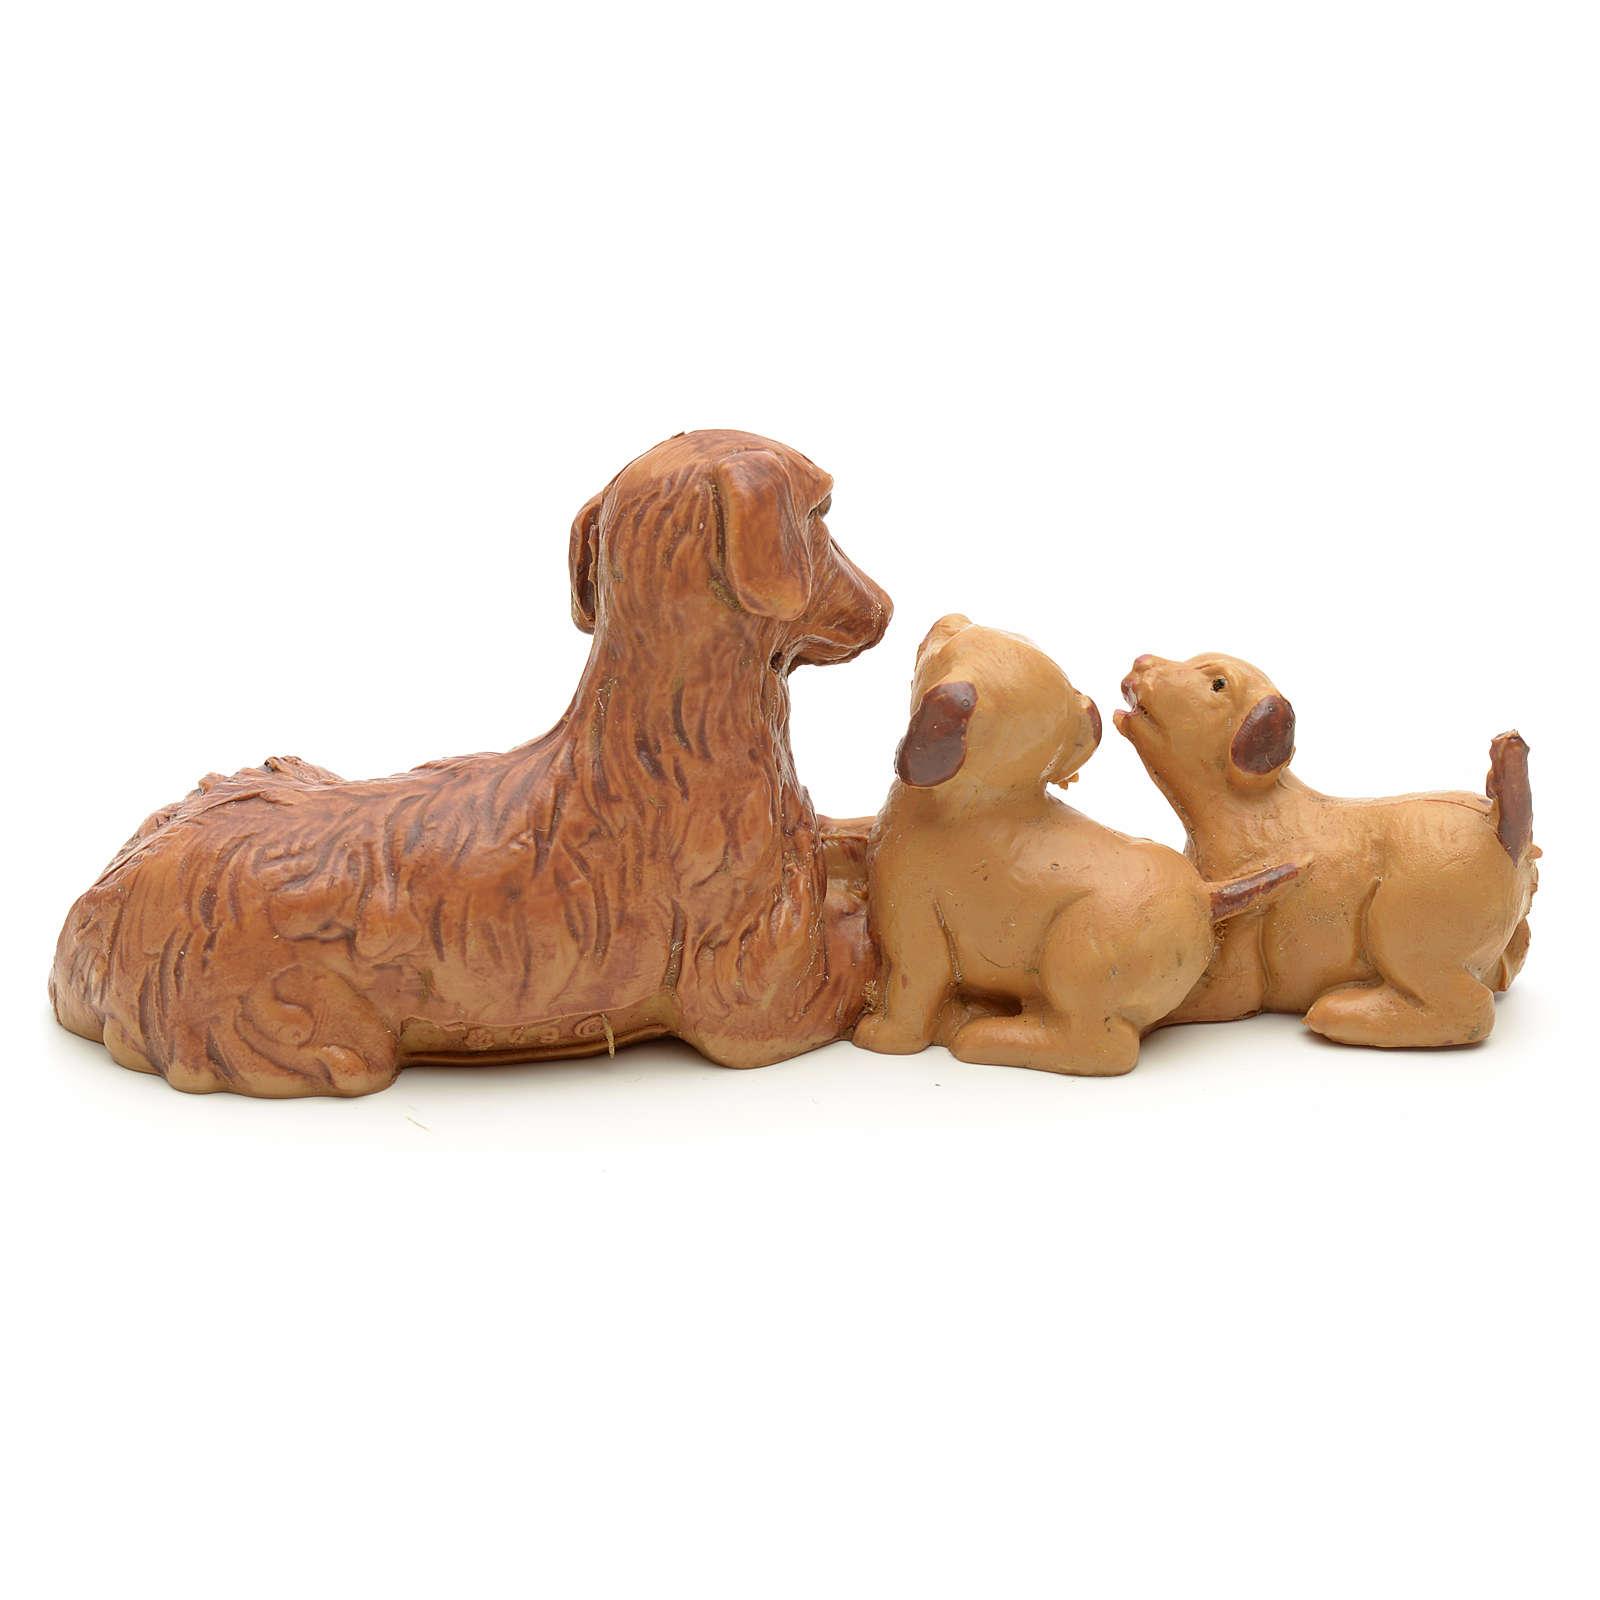 Familia de perritos cm 12 Fontanini 4